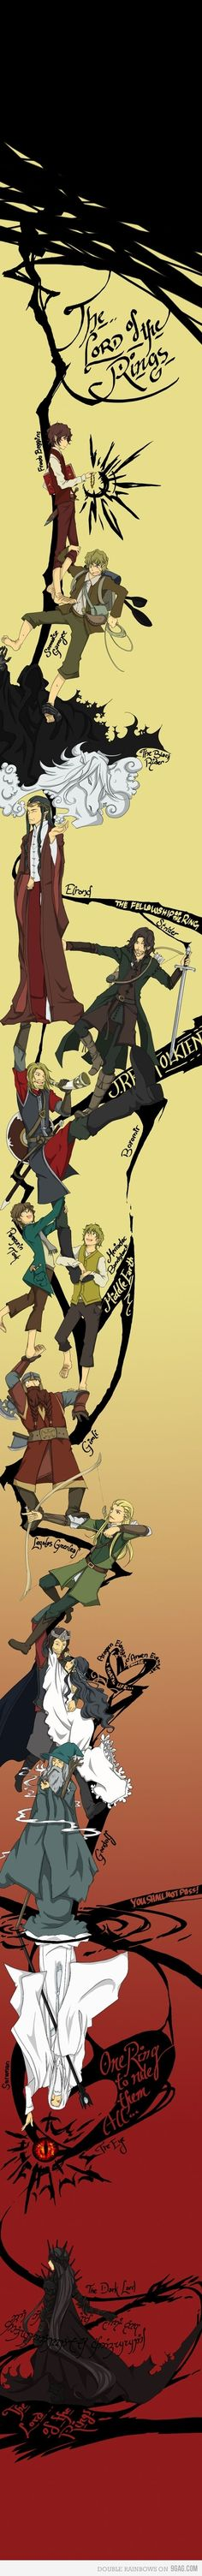 LOTR Anime style.